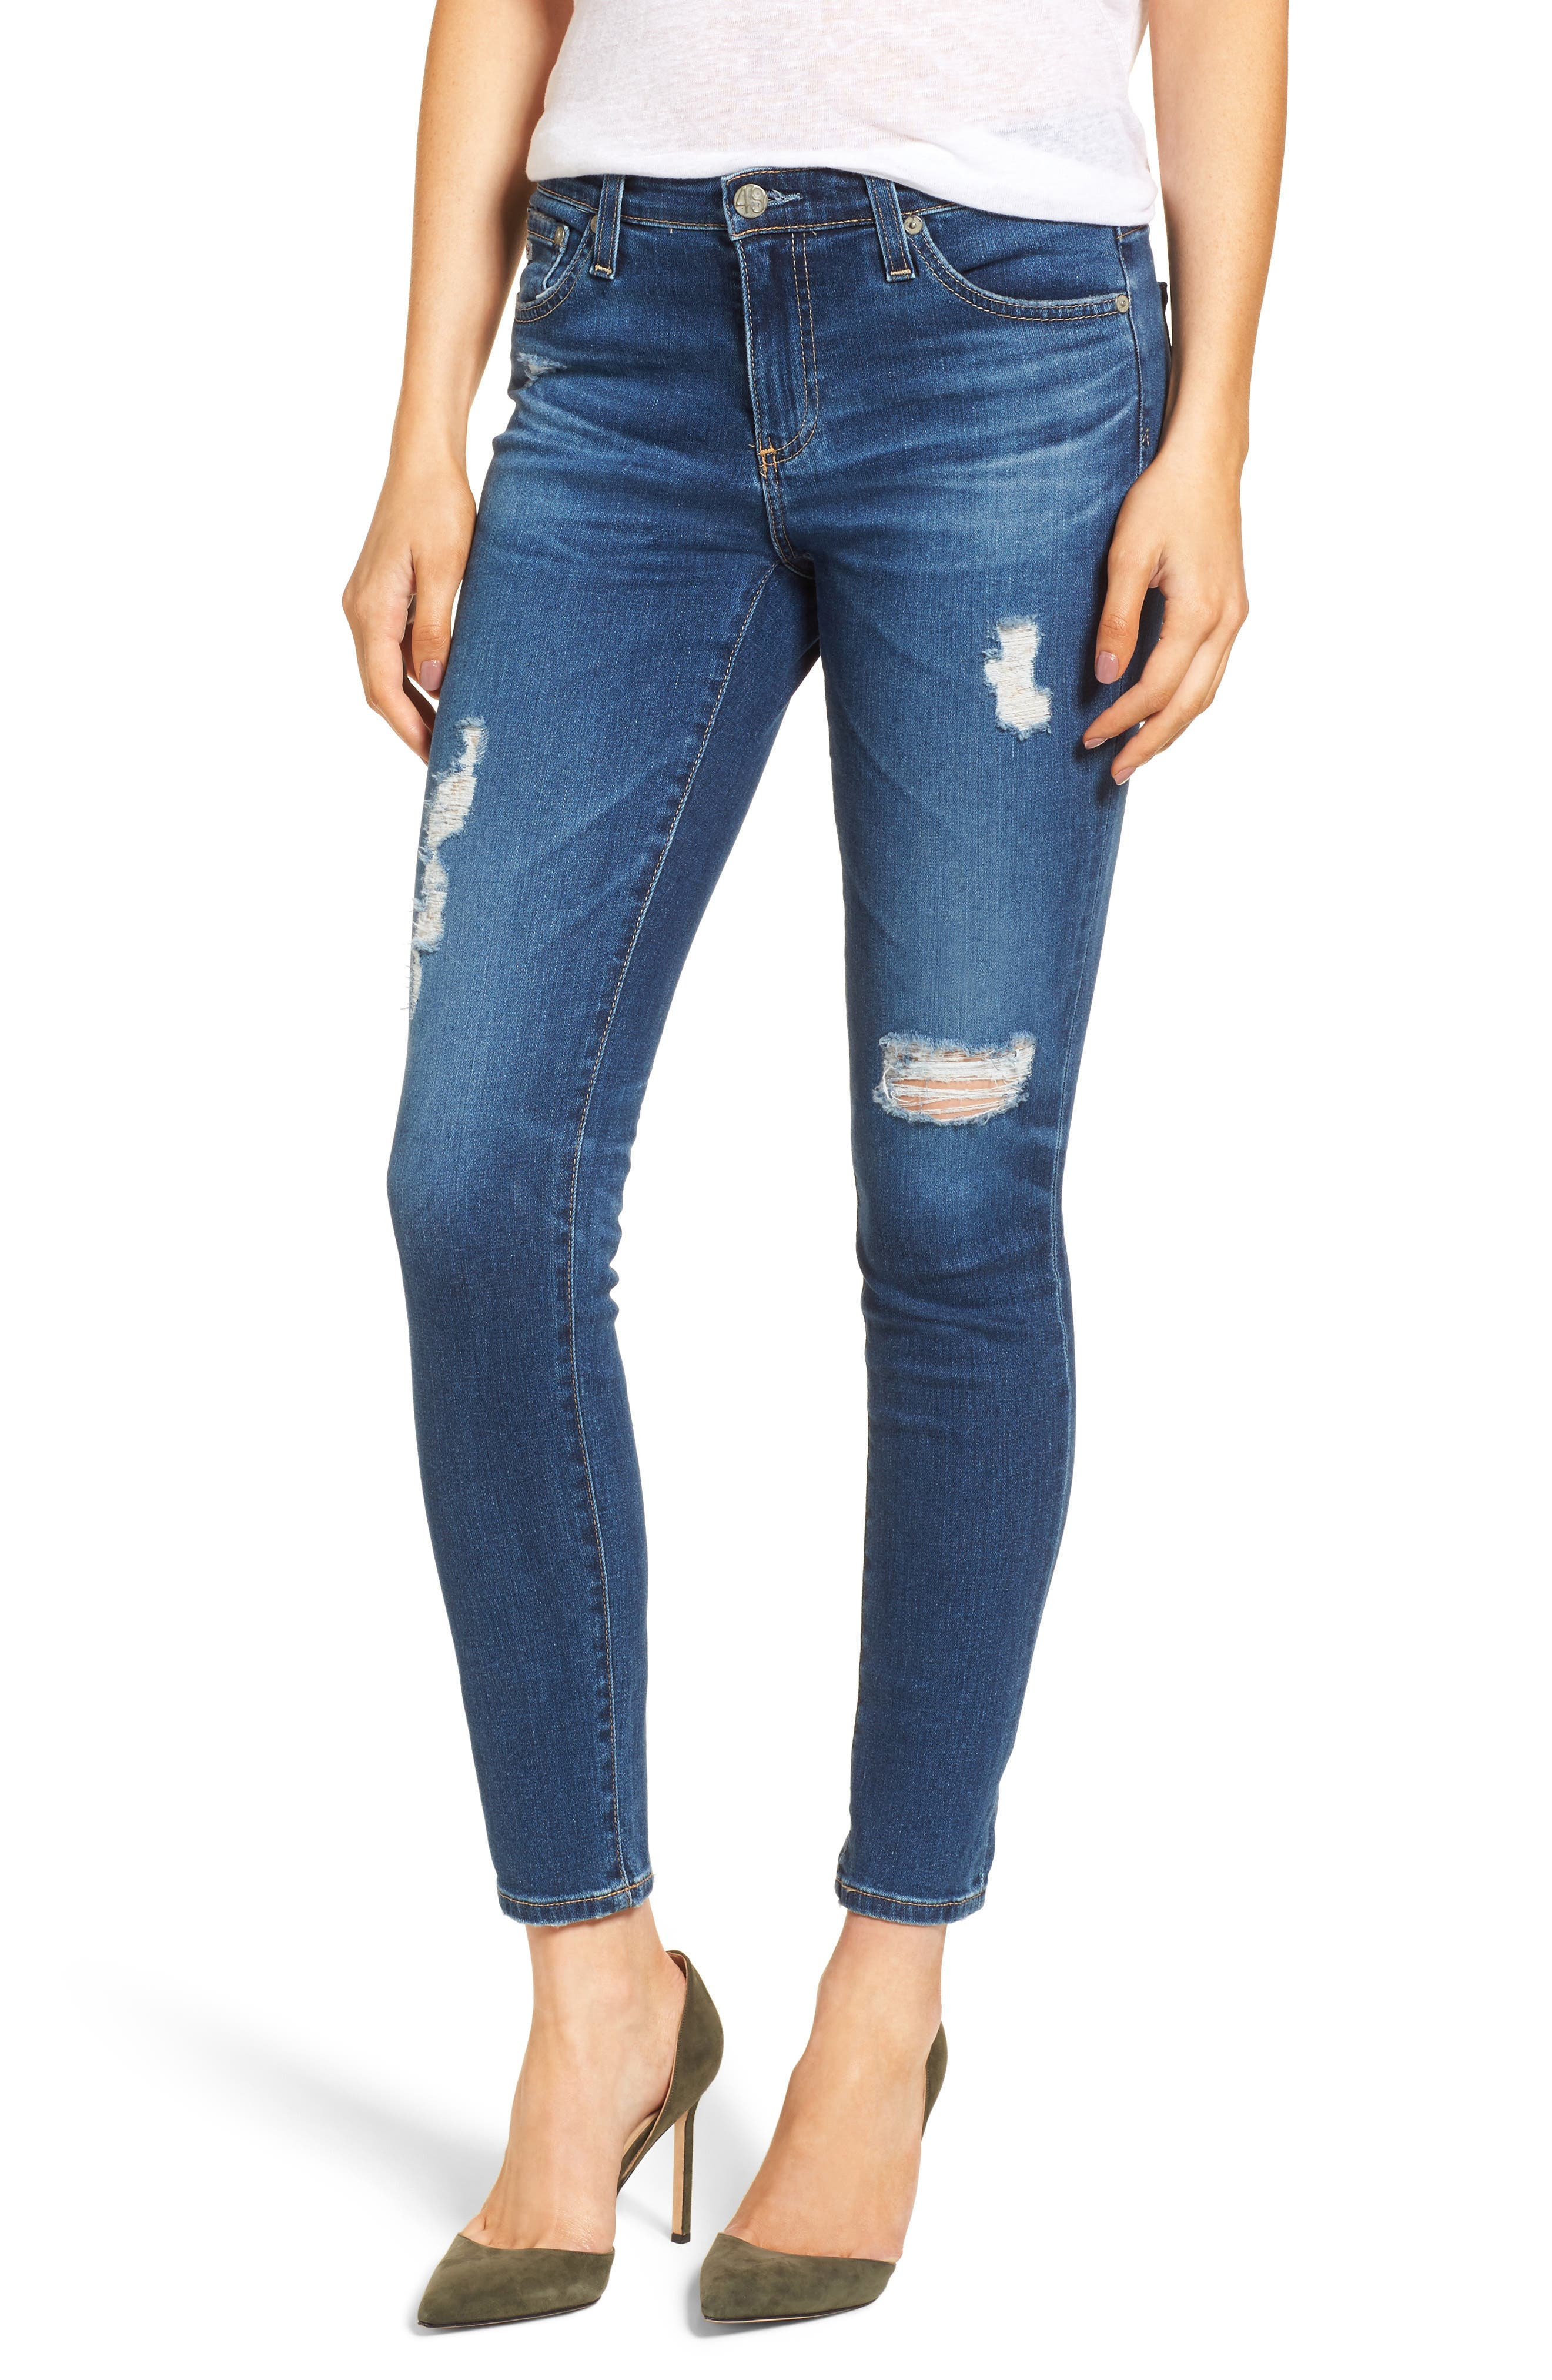 Main Image - AG The Legging Ankle Super Skinny Jeans (08 Y Portrait with Destruction)